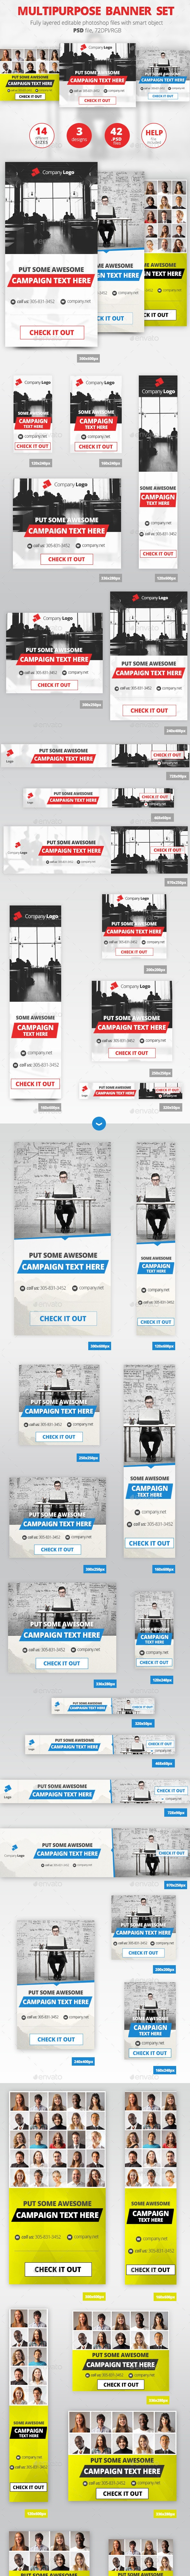 MultiPurpose Banner Set - Banners & Ads Web Elements